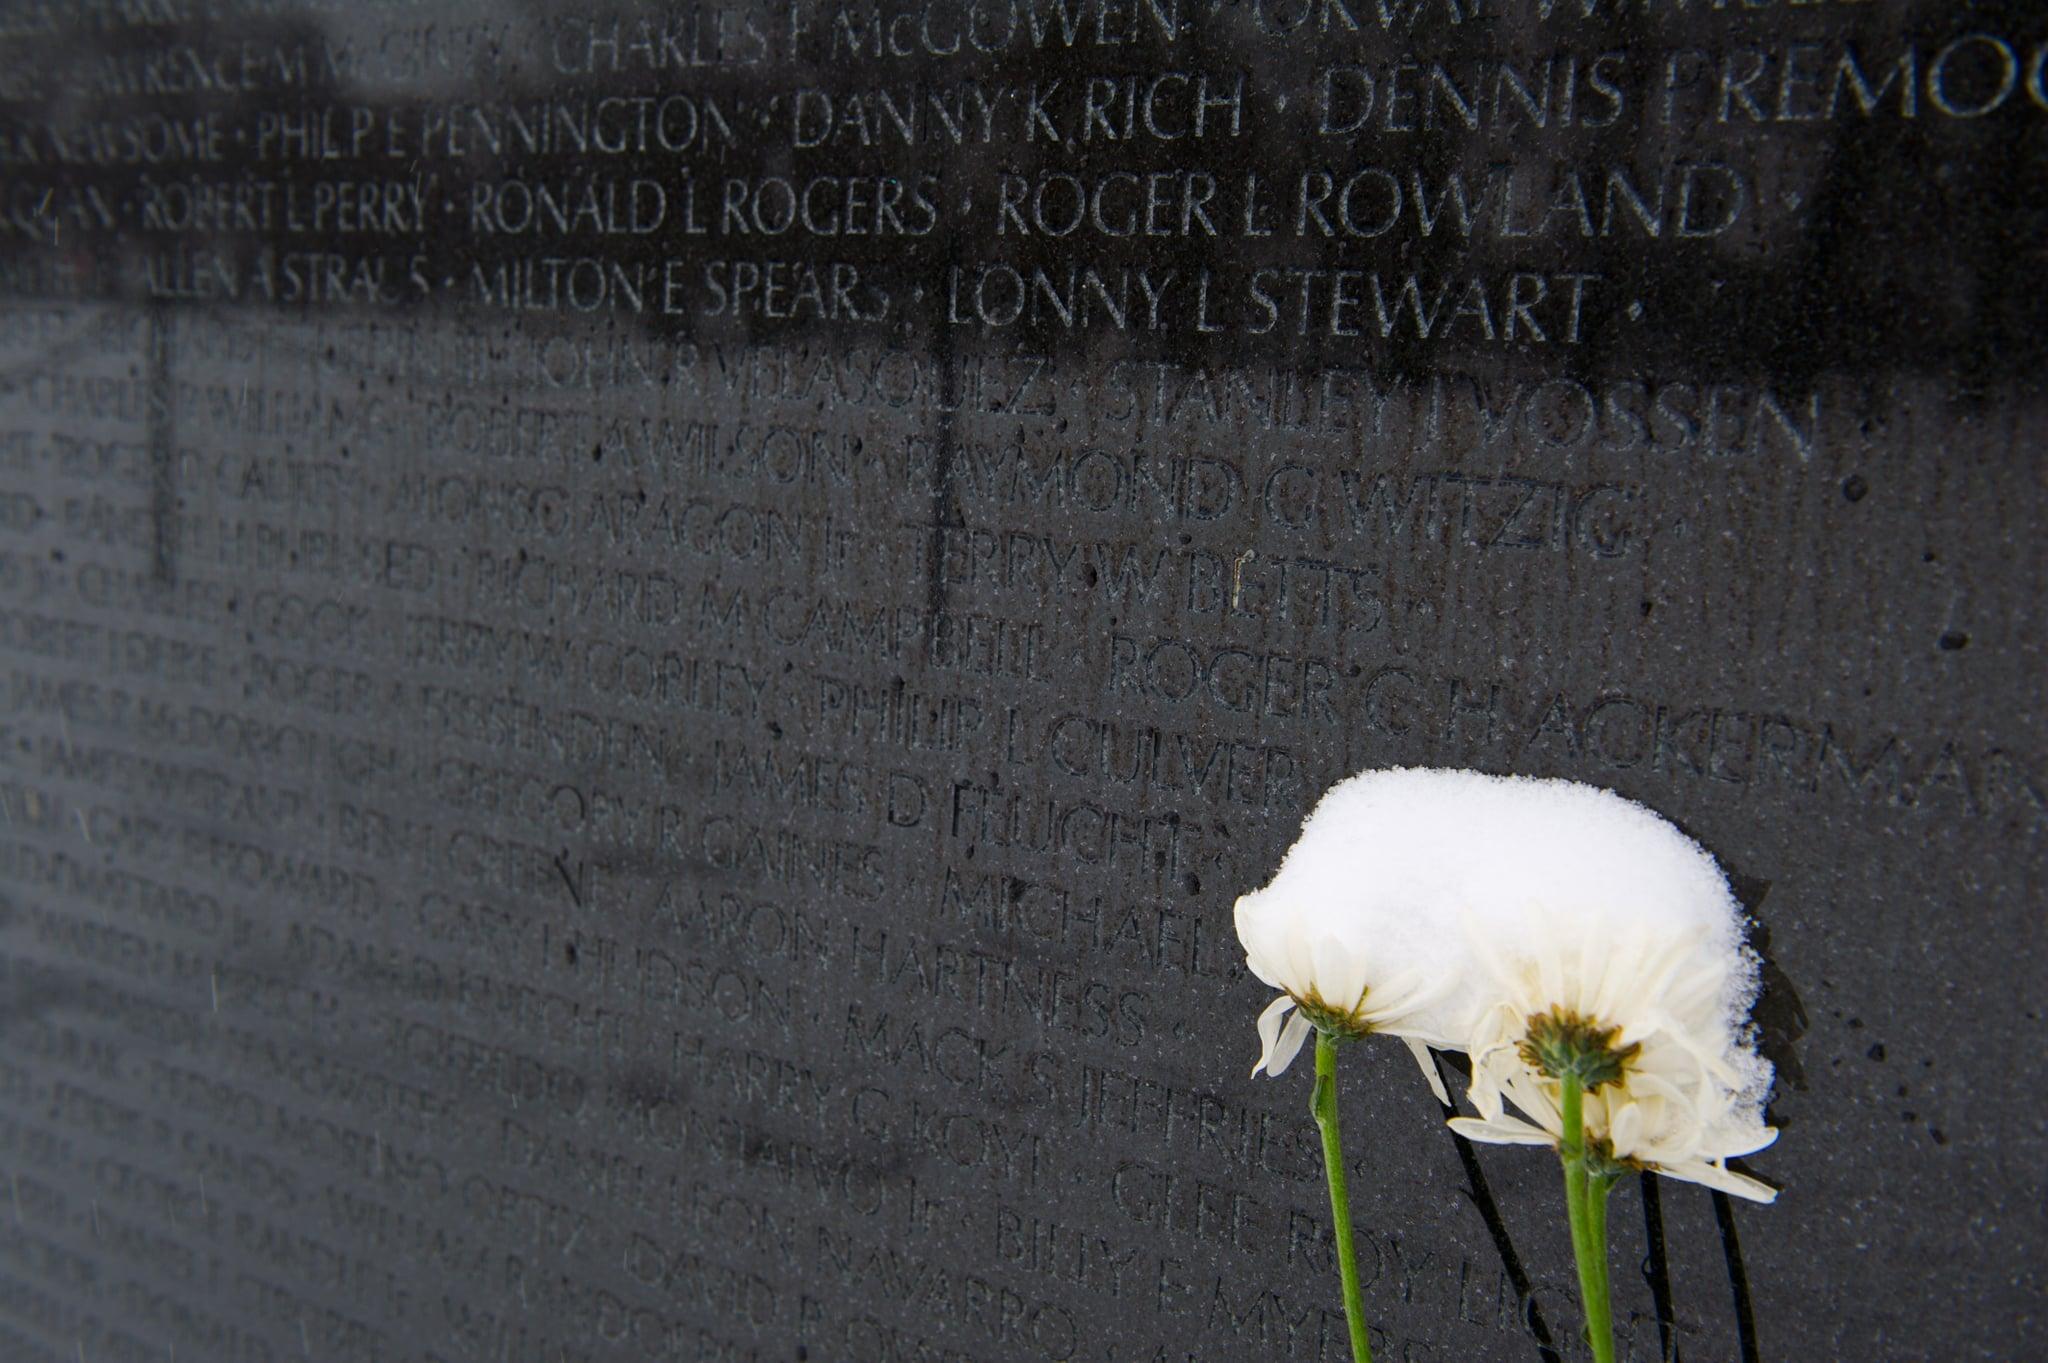 Flowers beside the Vietnam Veterans Memorial were covered in snow.